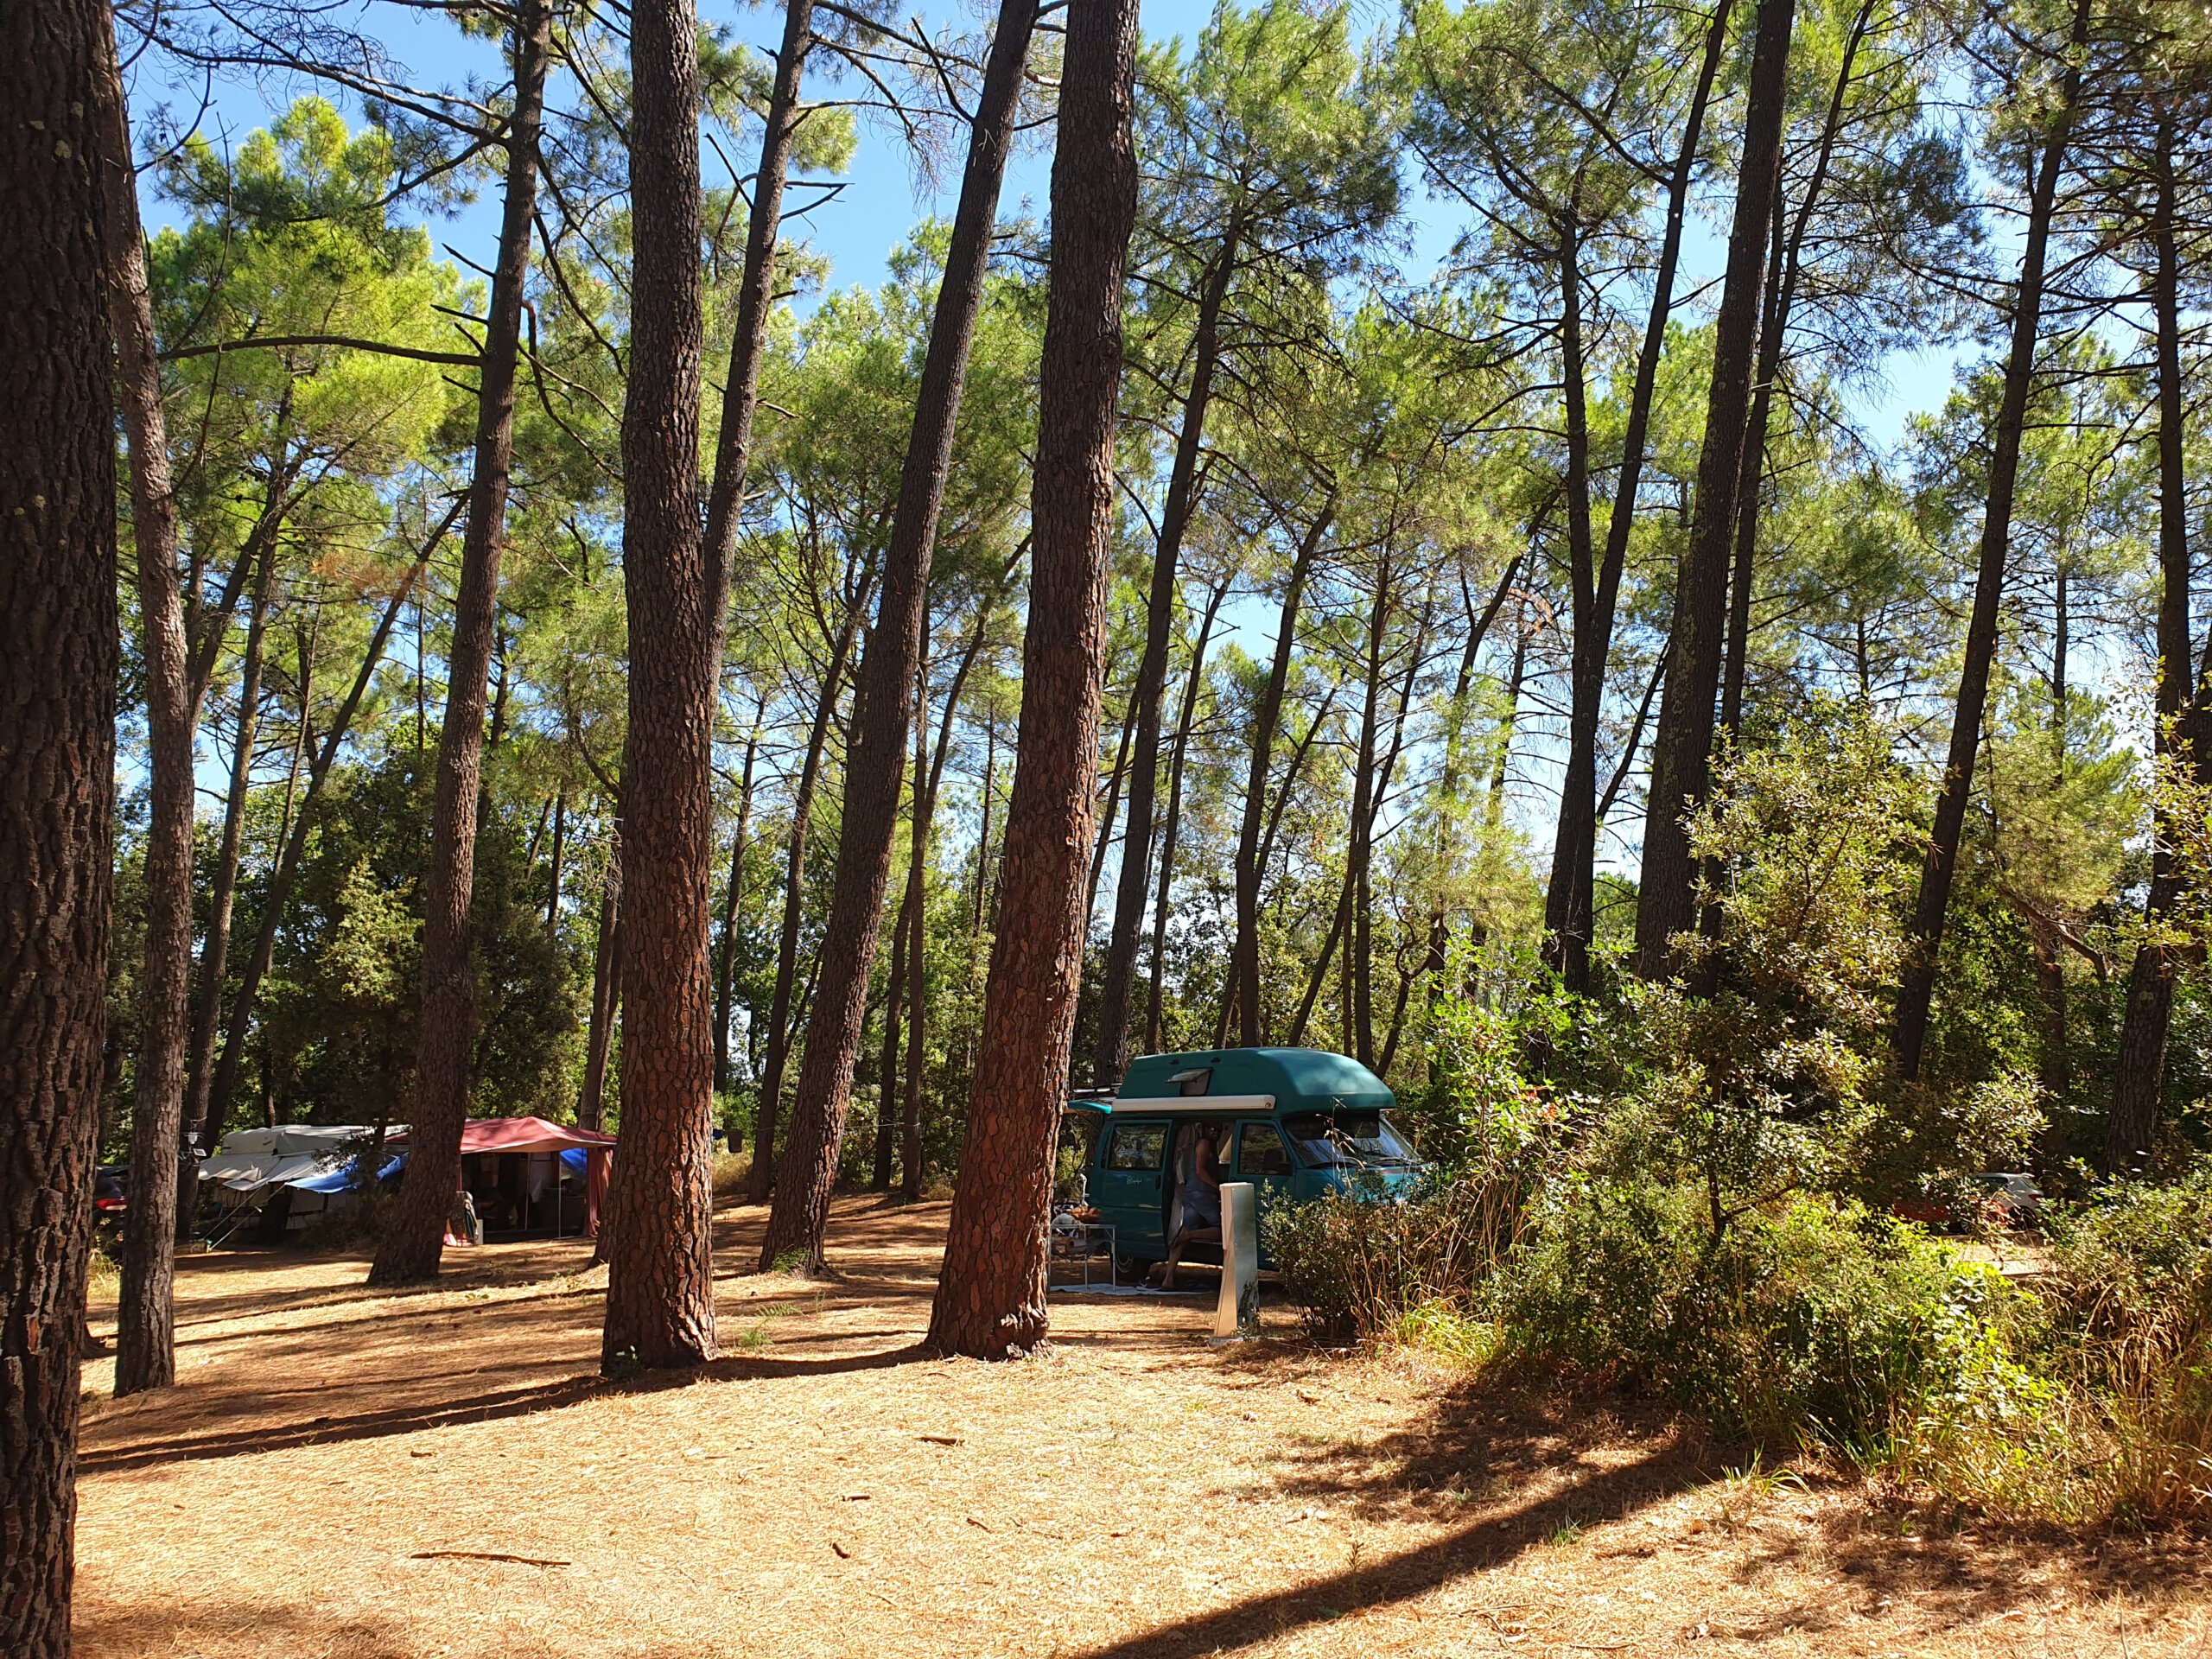 Ons kampeerbusje op camping La Sousta bij Pont du Gard